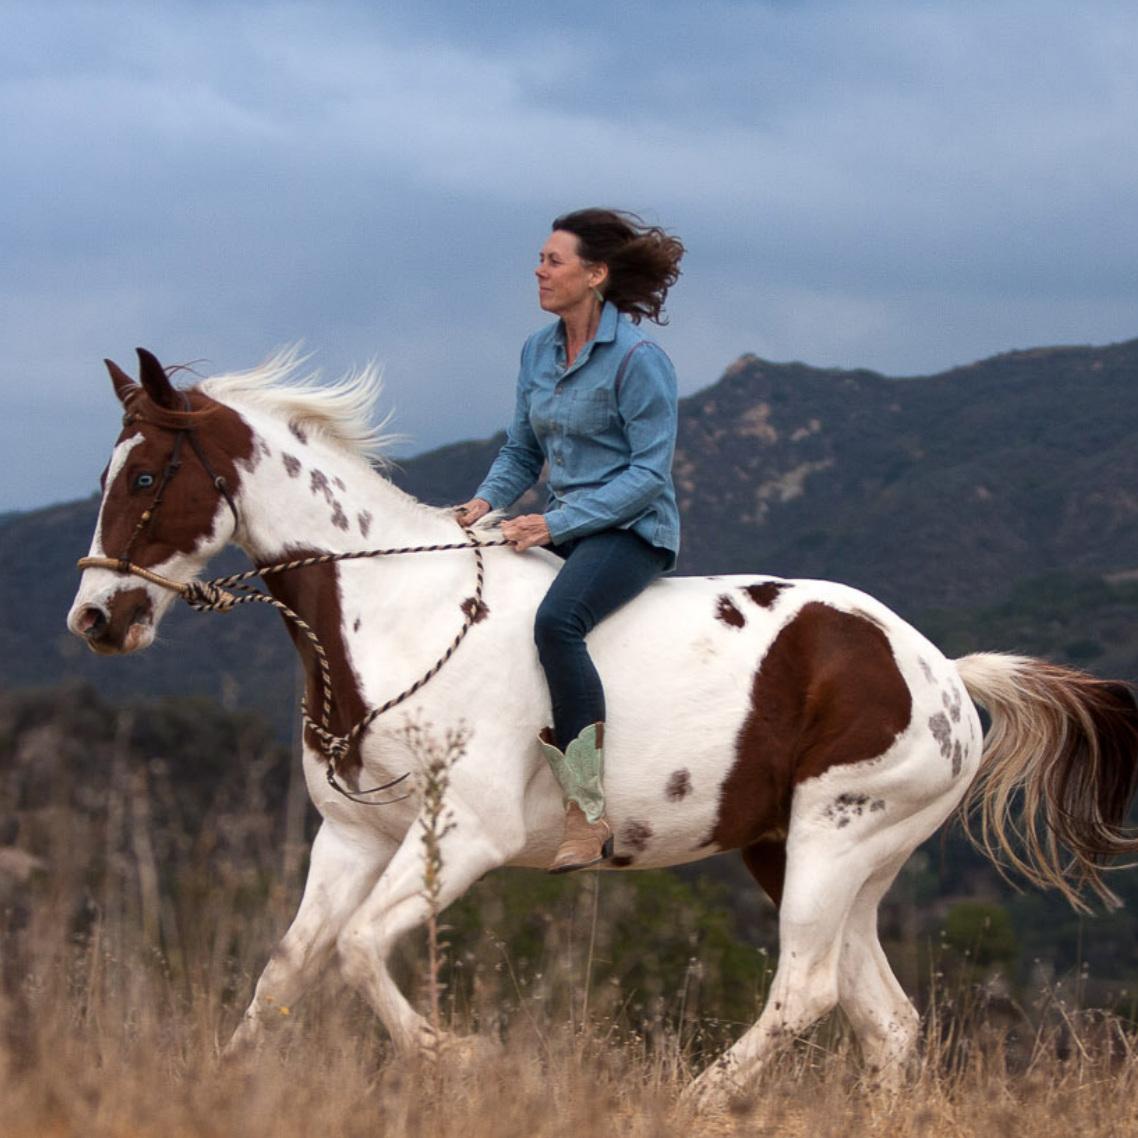 Cassandra Ogier - The Reflective Horse